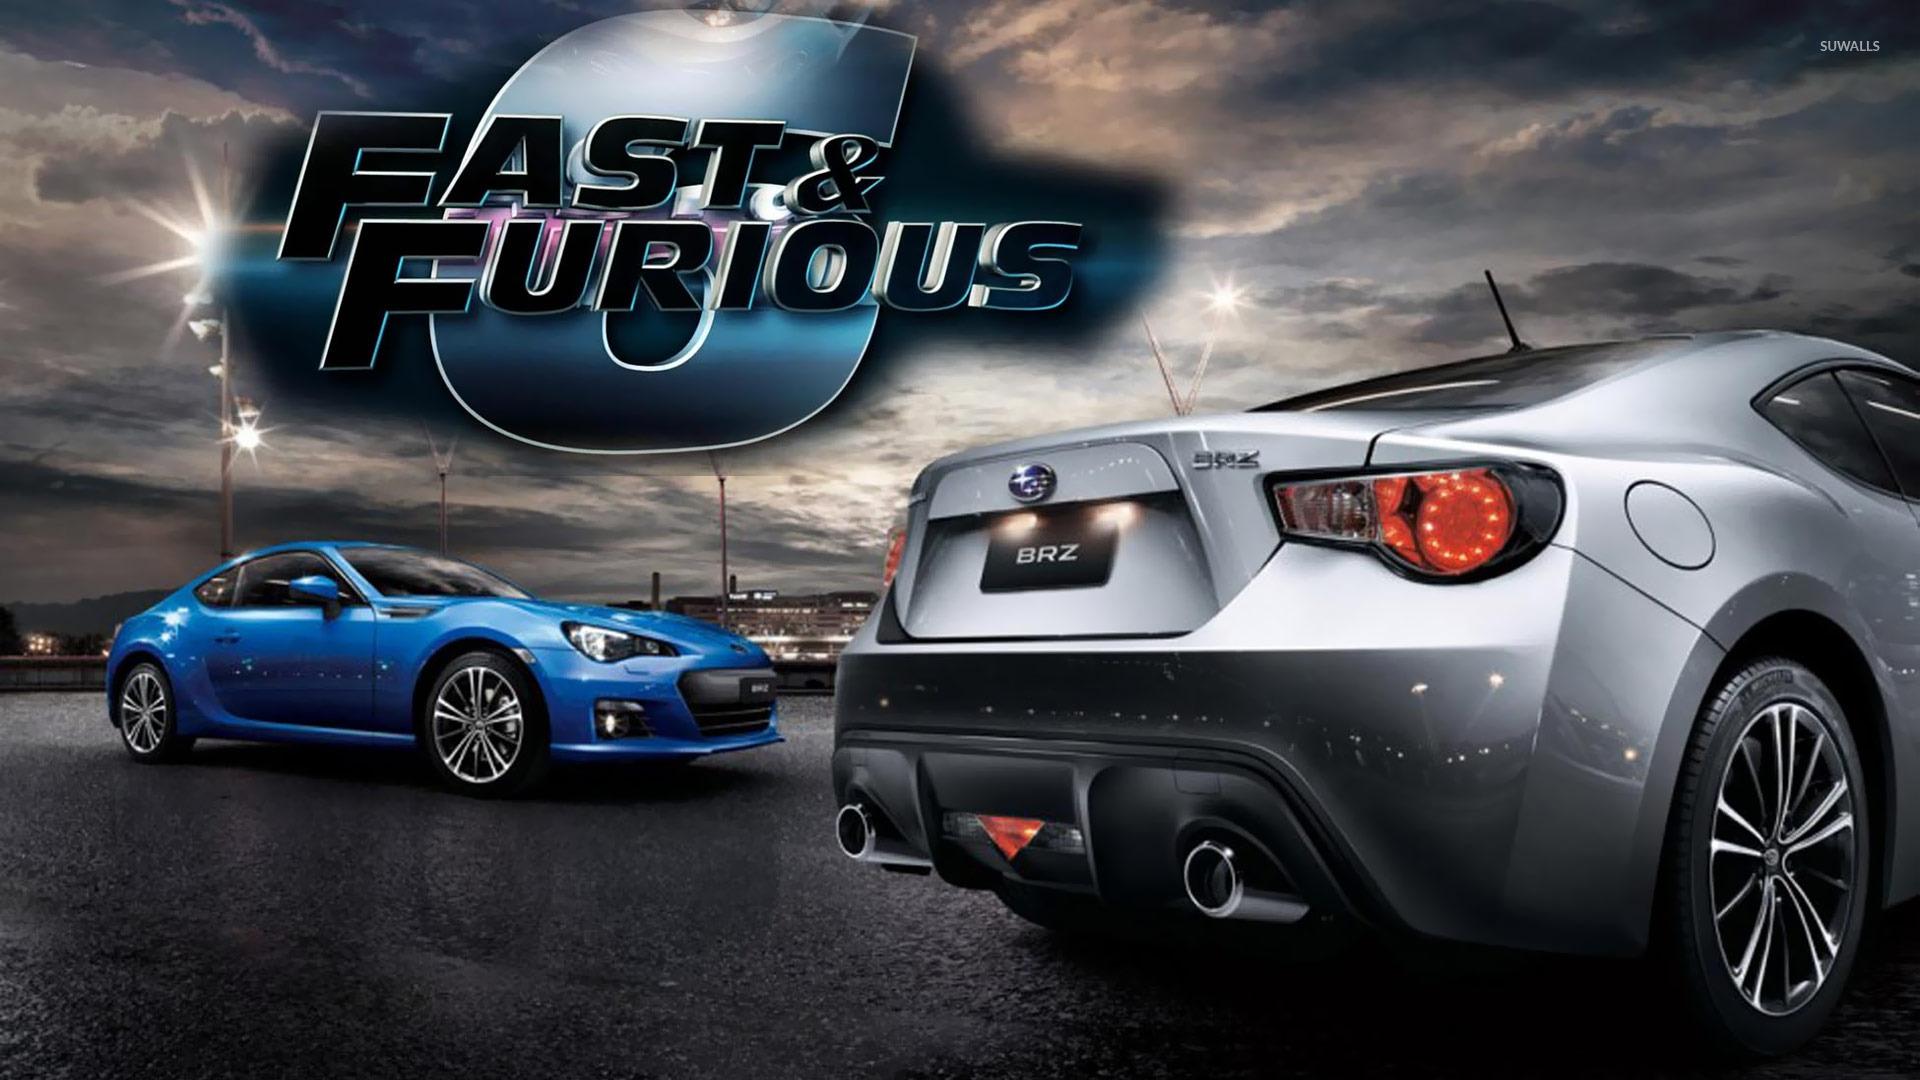 Fast & Furious 6 [2] wallpaper